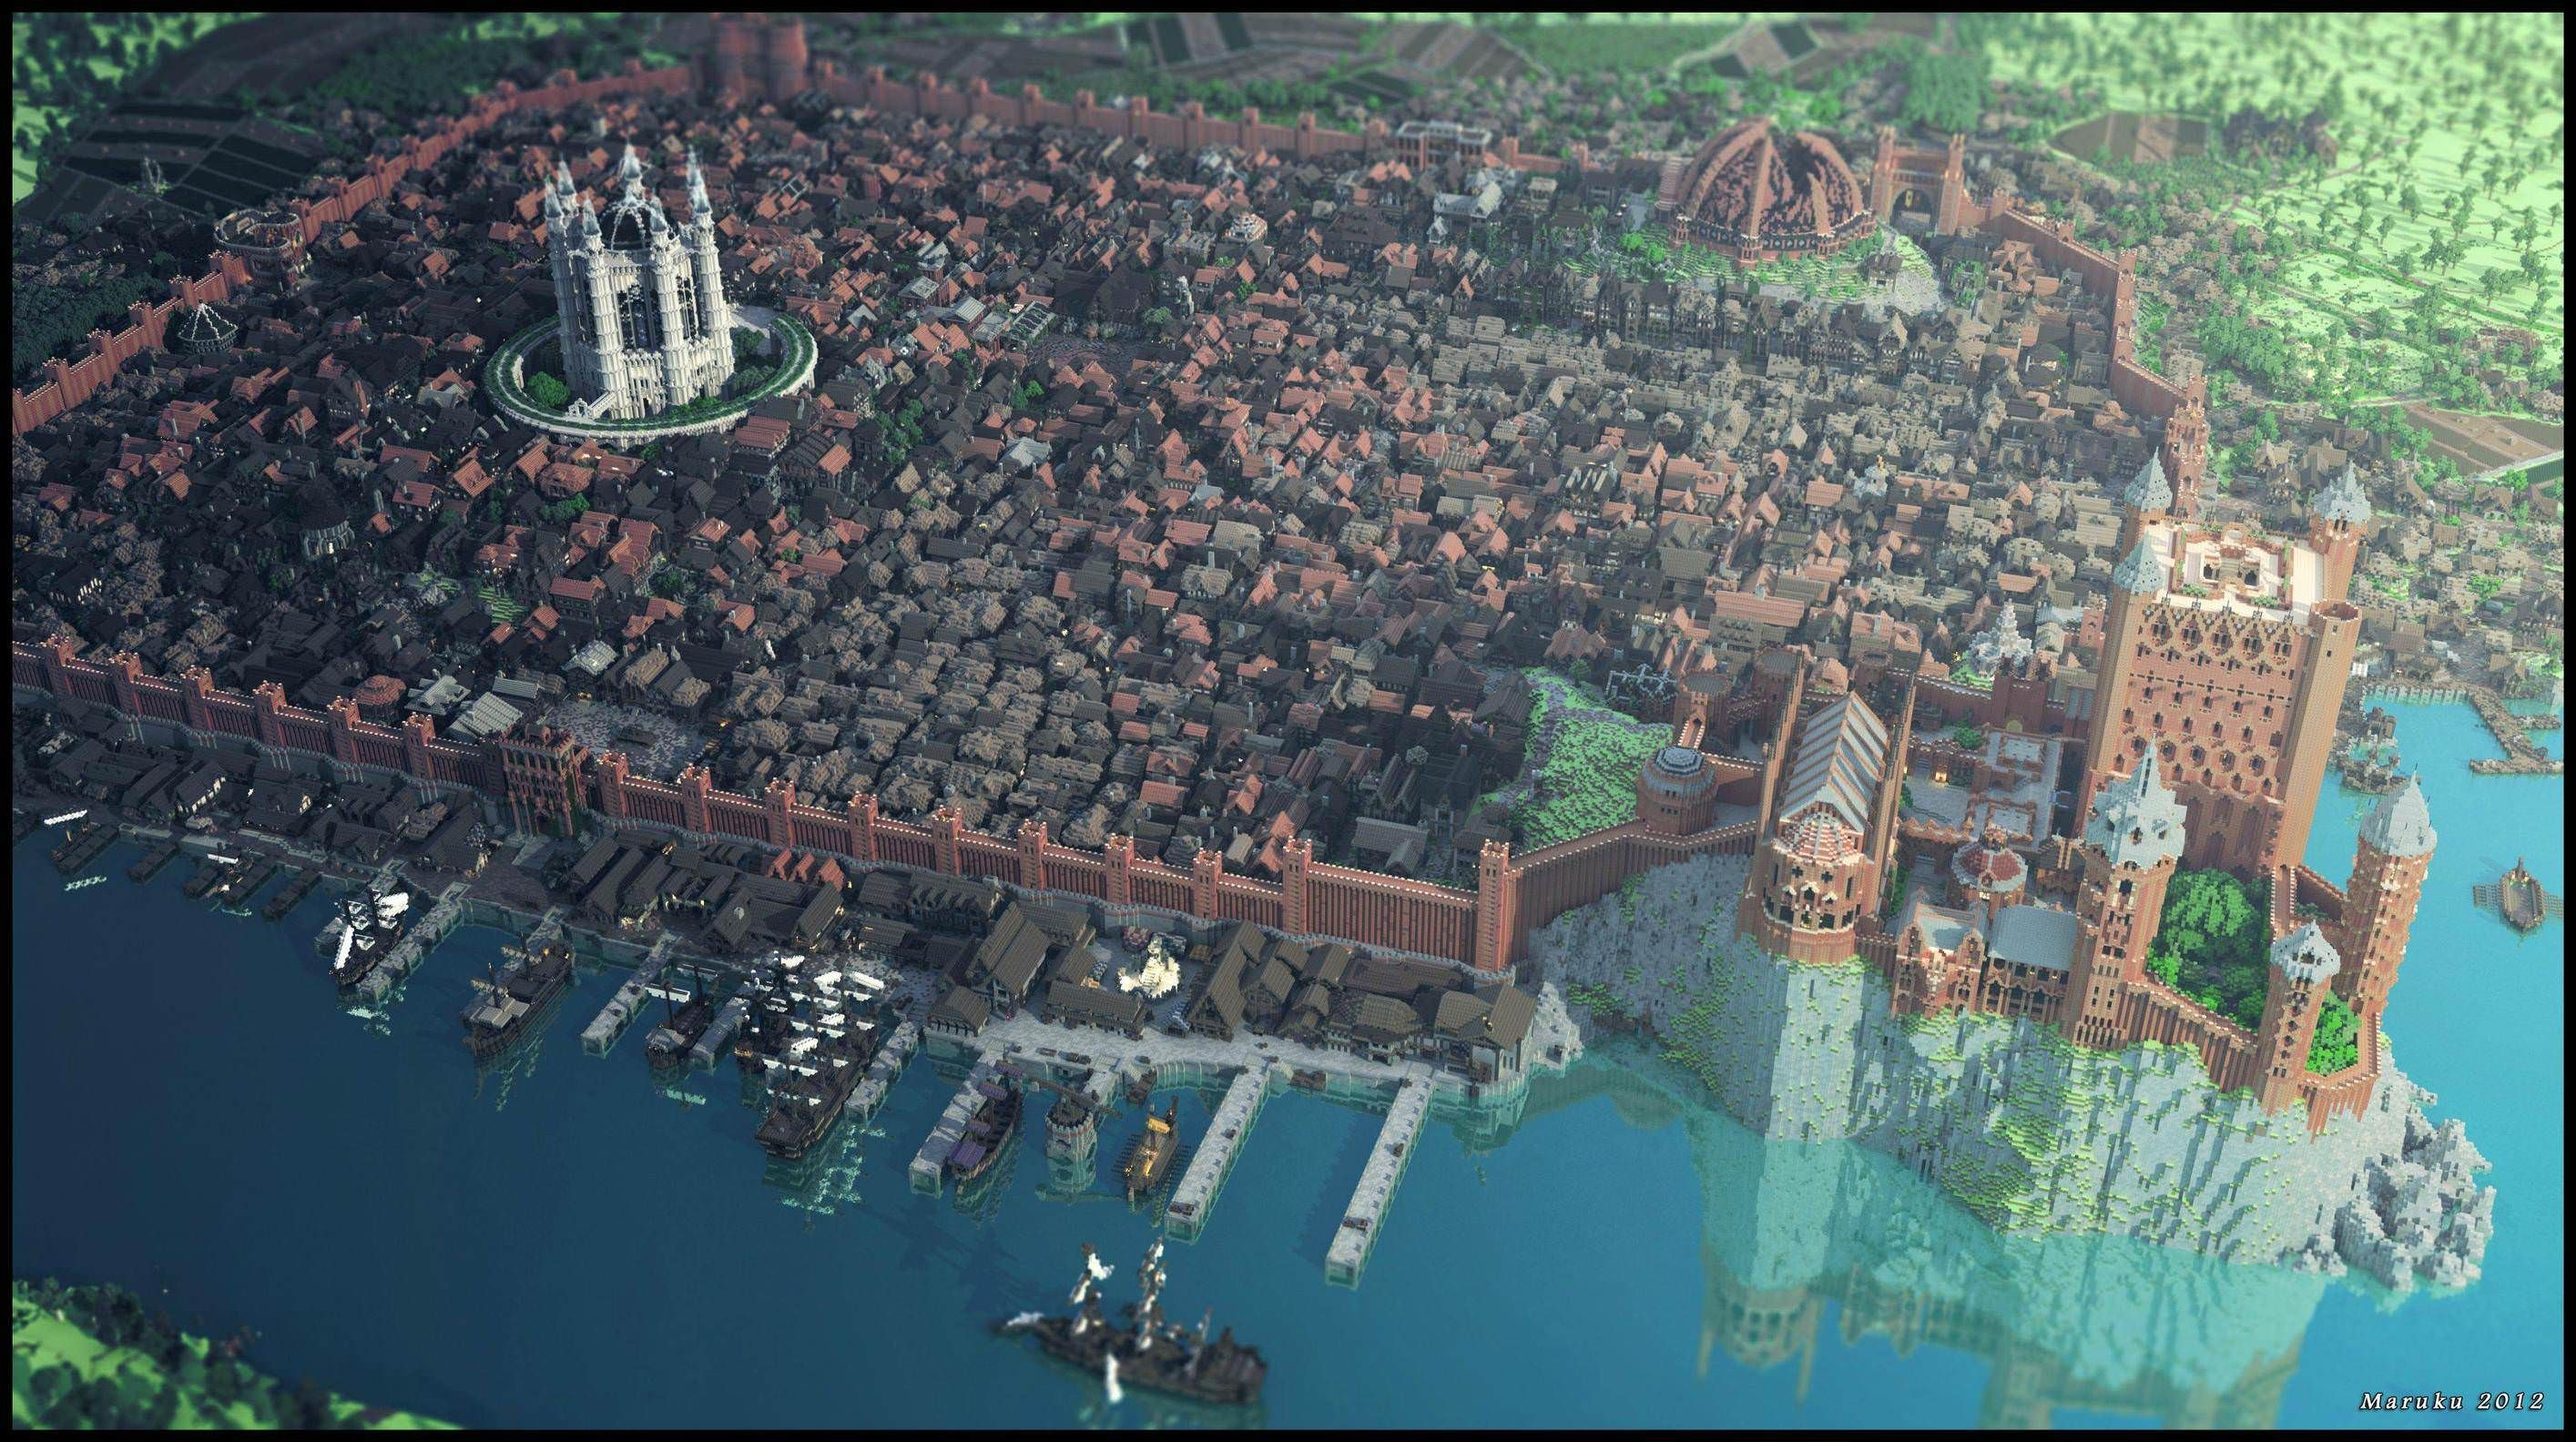 King S Landing Rendered In Minecraft Latestgames Pinterest Craft